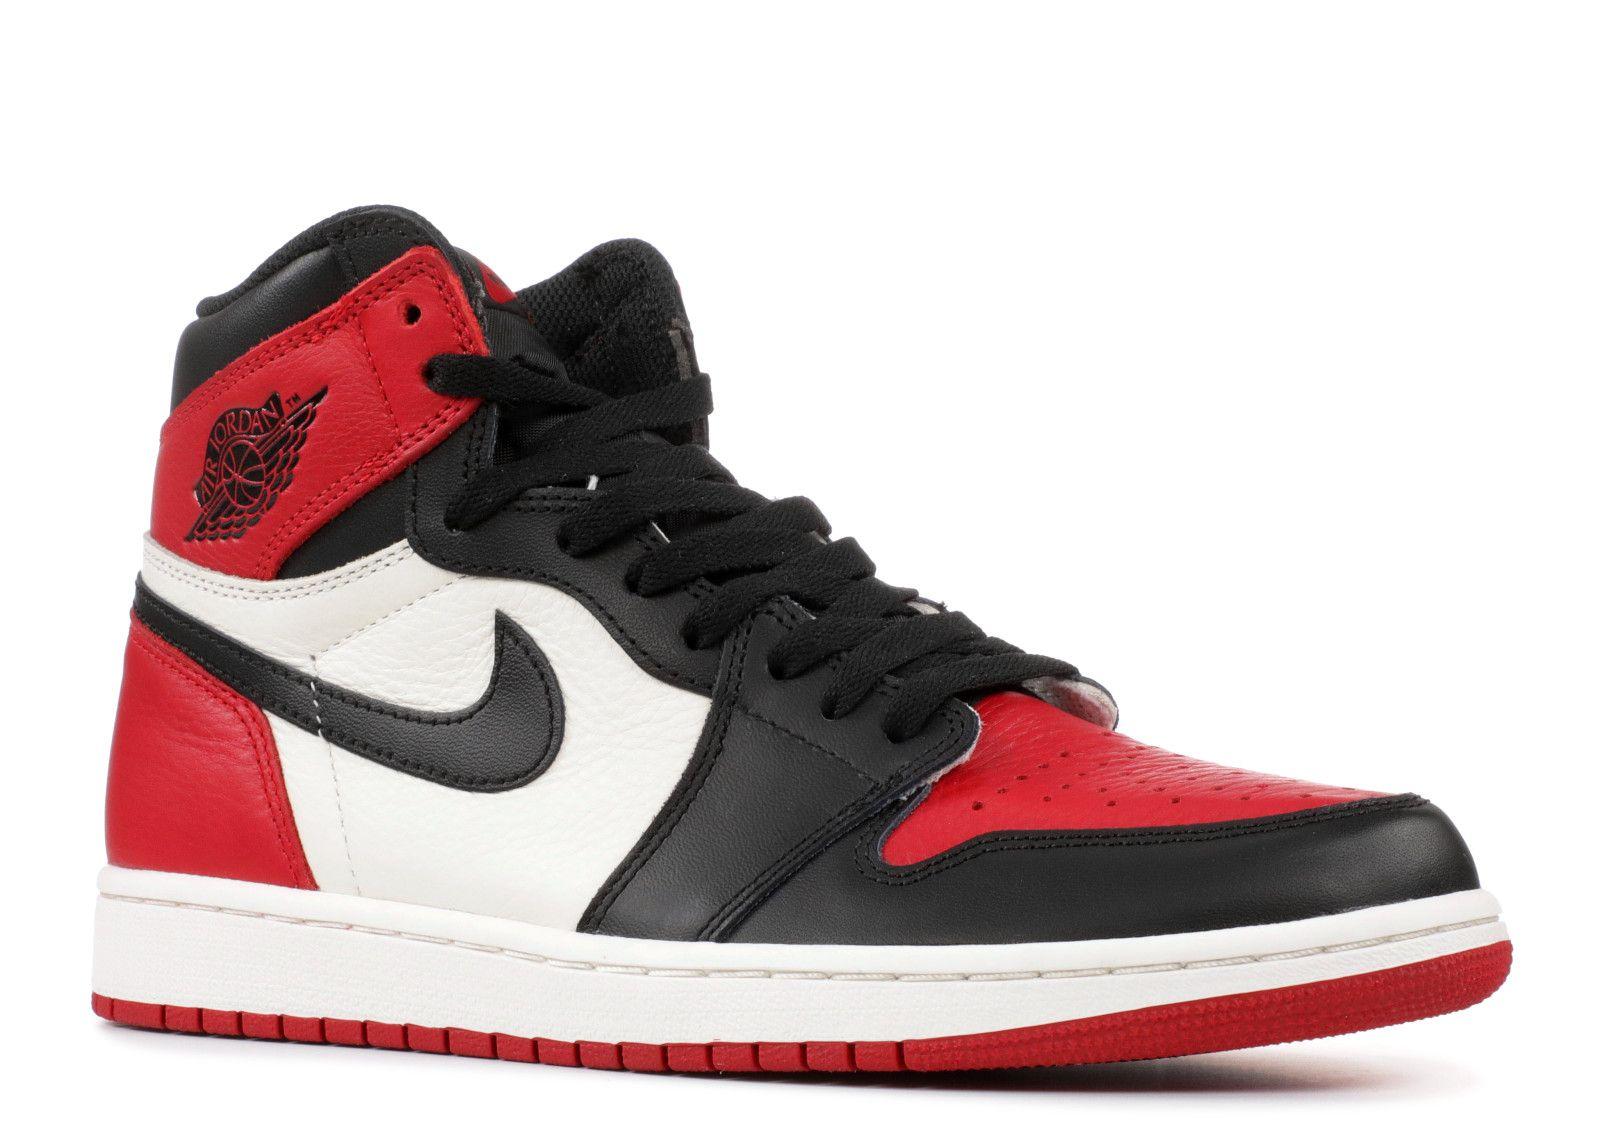 Air Jordan 1 Retro High Og Bred Toe Air Jordan 555088 610 Gym Red Summit White Black Air Jordans Best Sneakers Air Jordans Retro